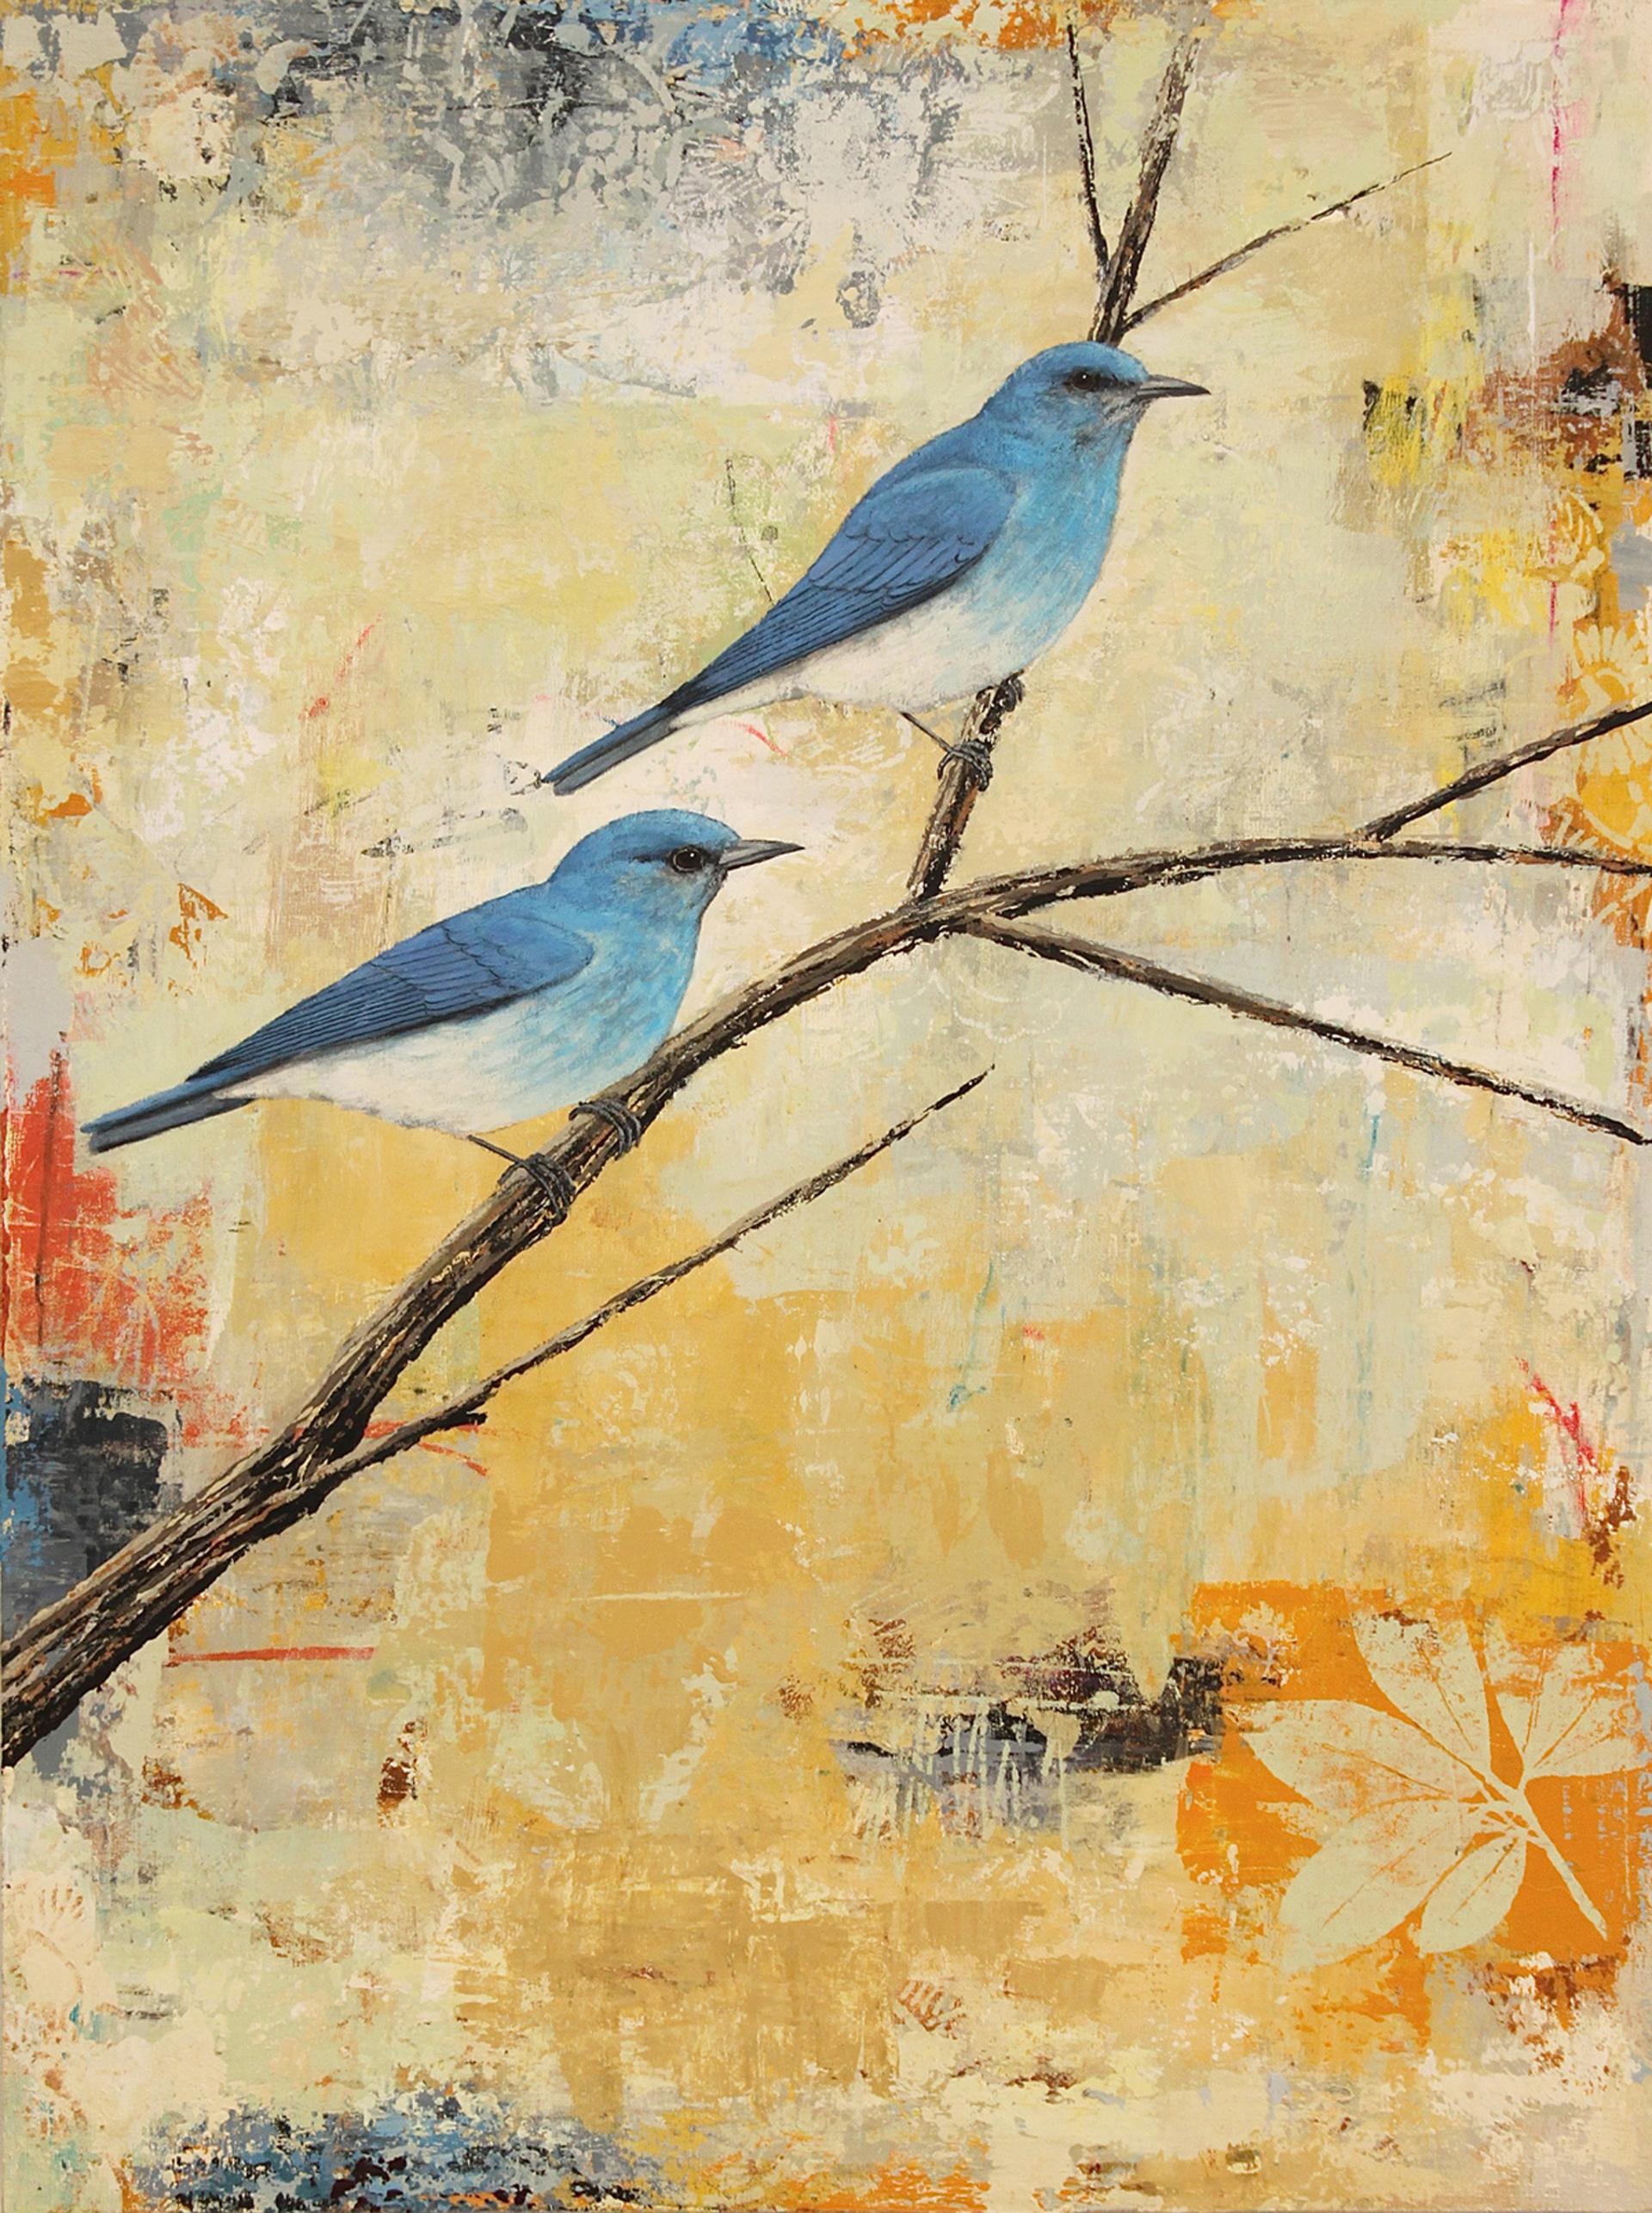 Mountain Bluebirds 3 by Paul Brigham